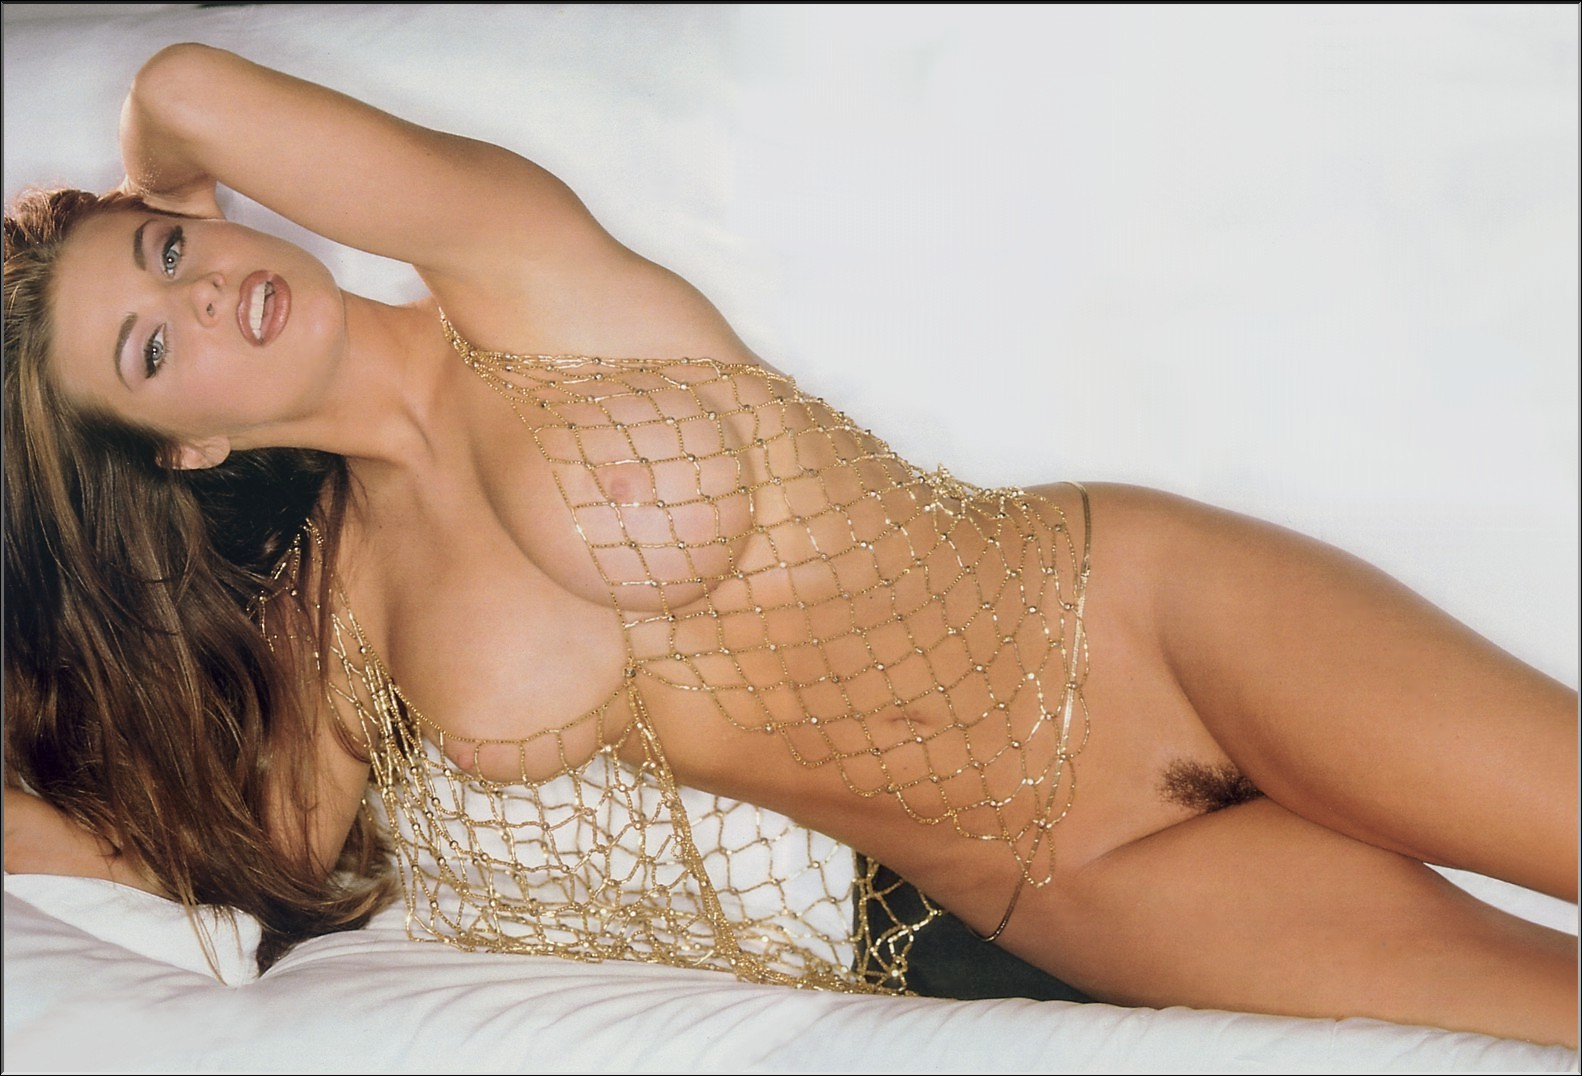 Семенович эротика и порно 22 фотография